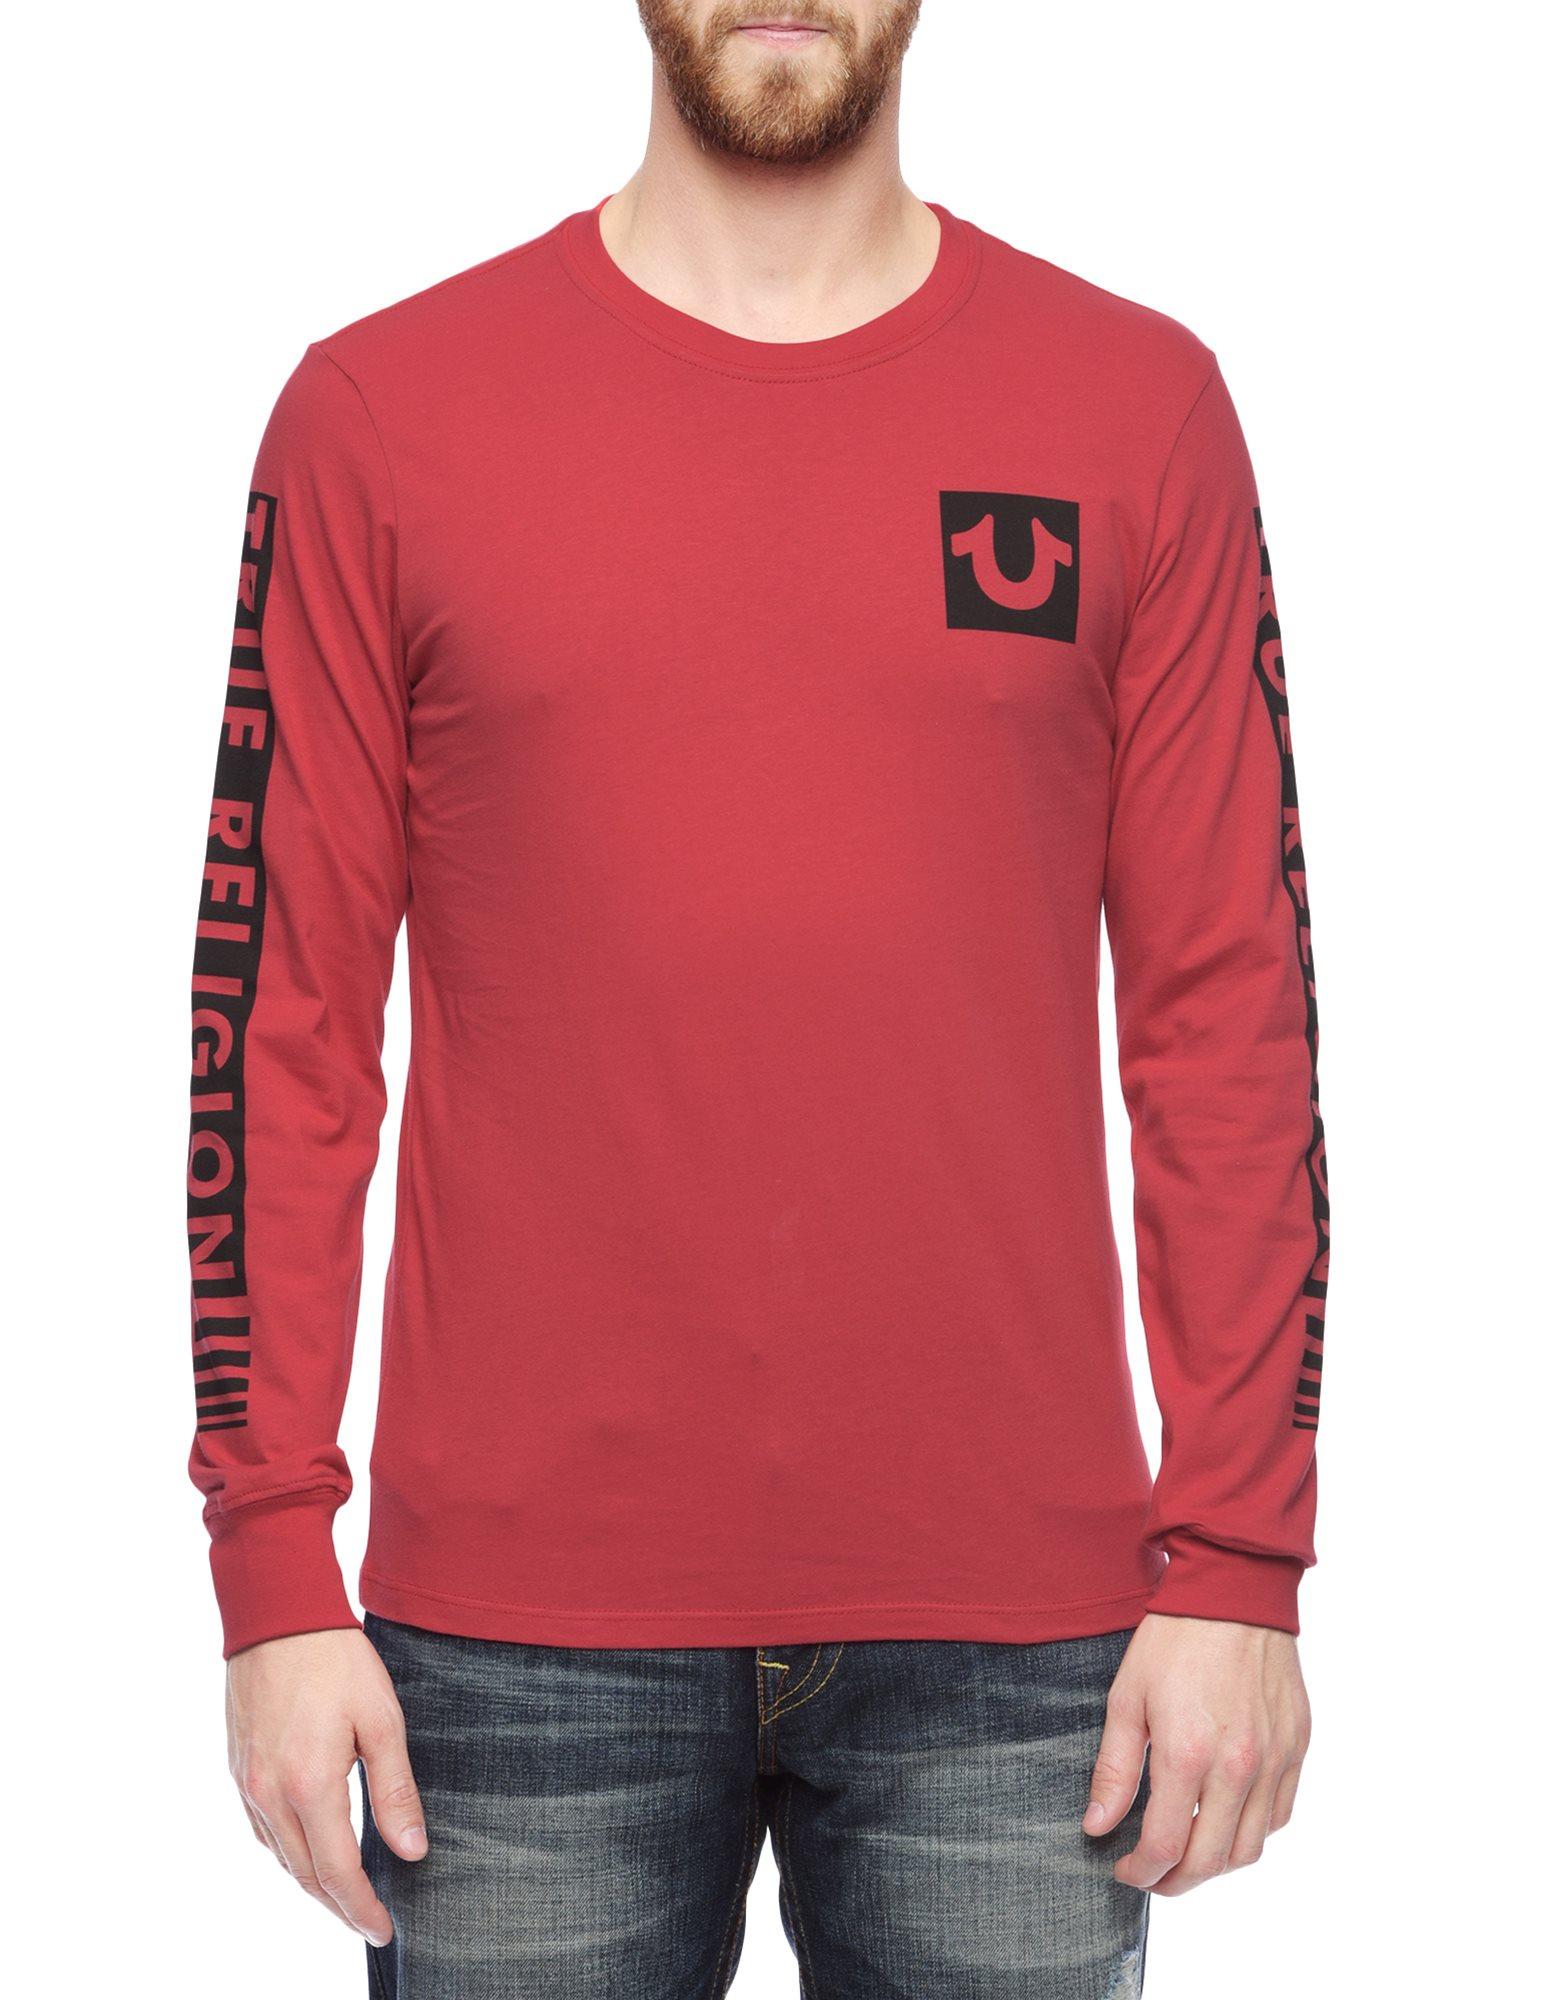 True Religion Sweaters Pink